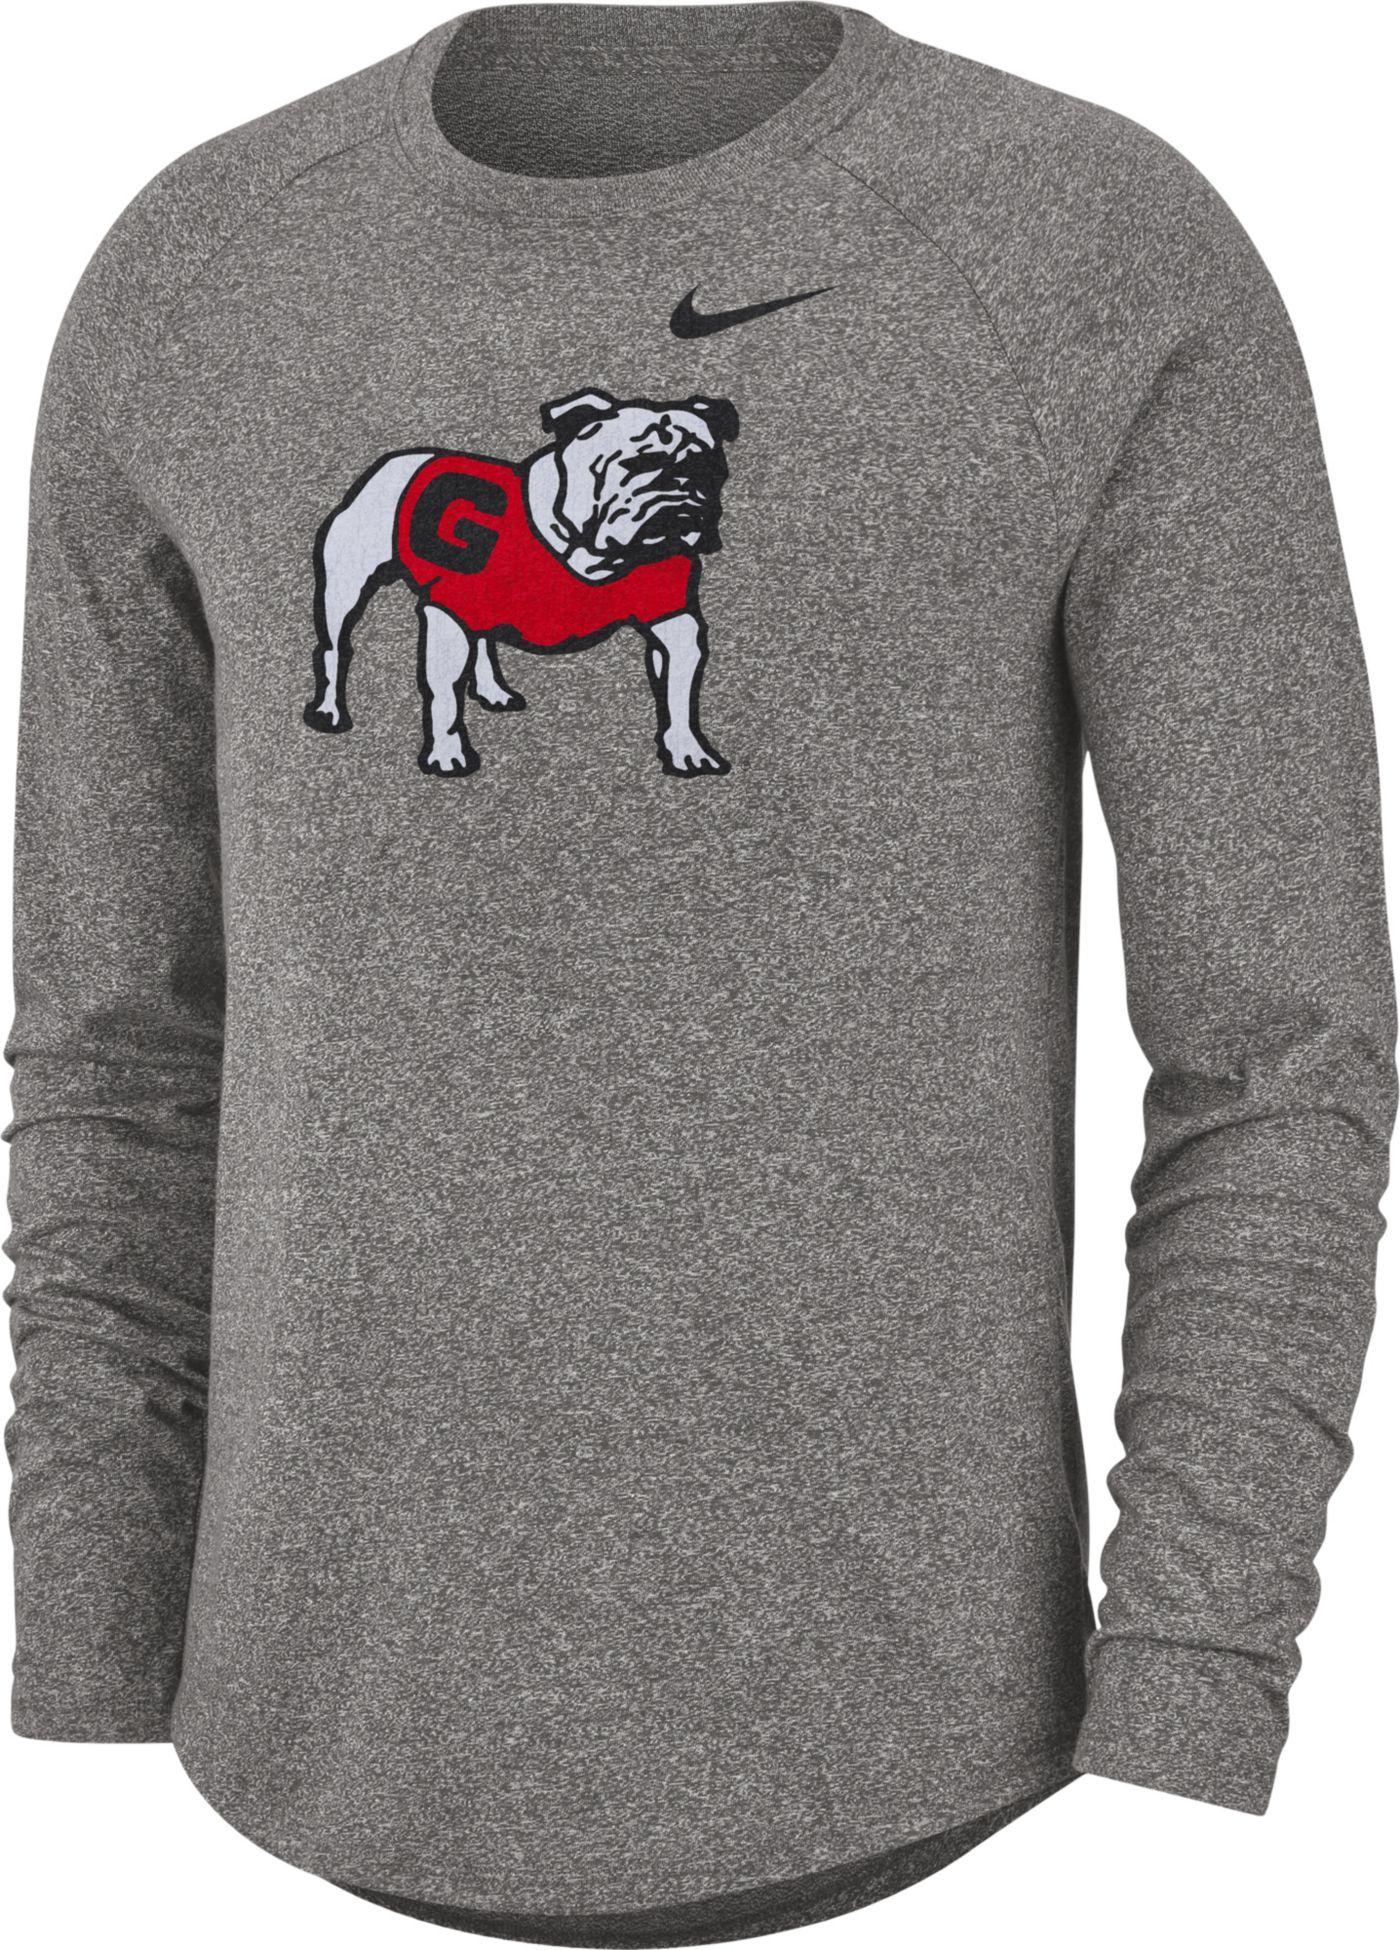 Nike Men's Georgia Bulldogs Grey Marled Raglan Long Sleeve T-Shirt